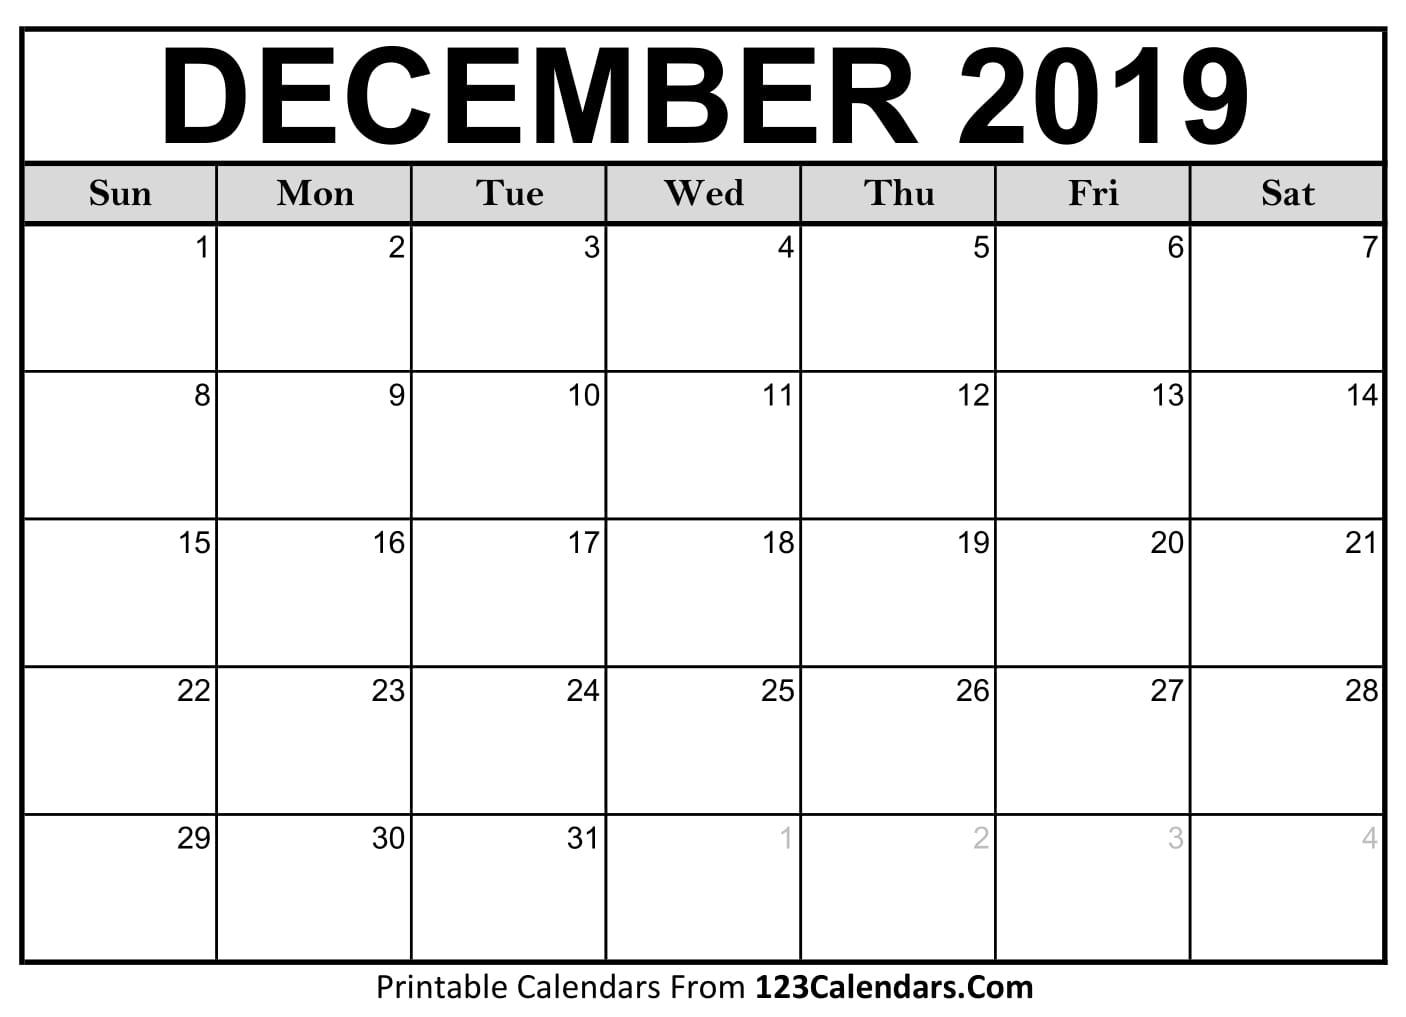 December 2019 Printable Calendar | 123Calendars intended for Blank Calendars December Printable